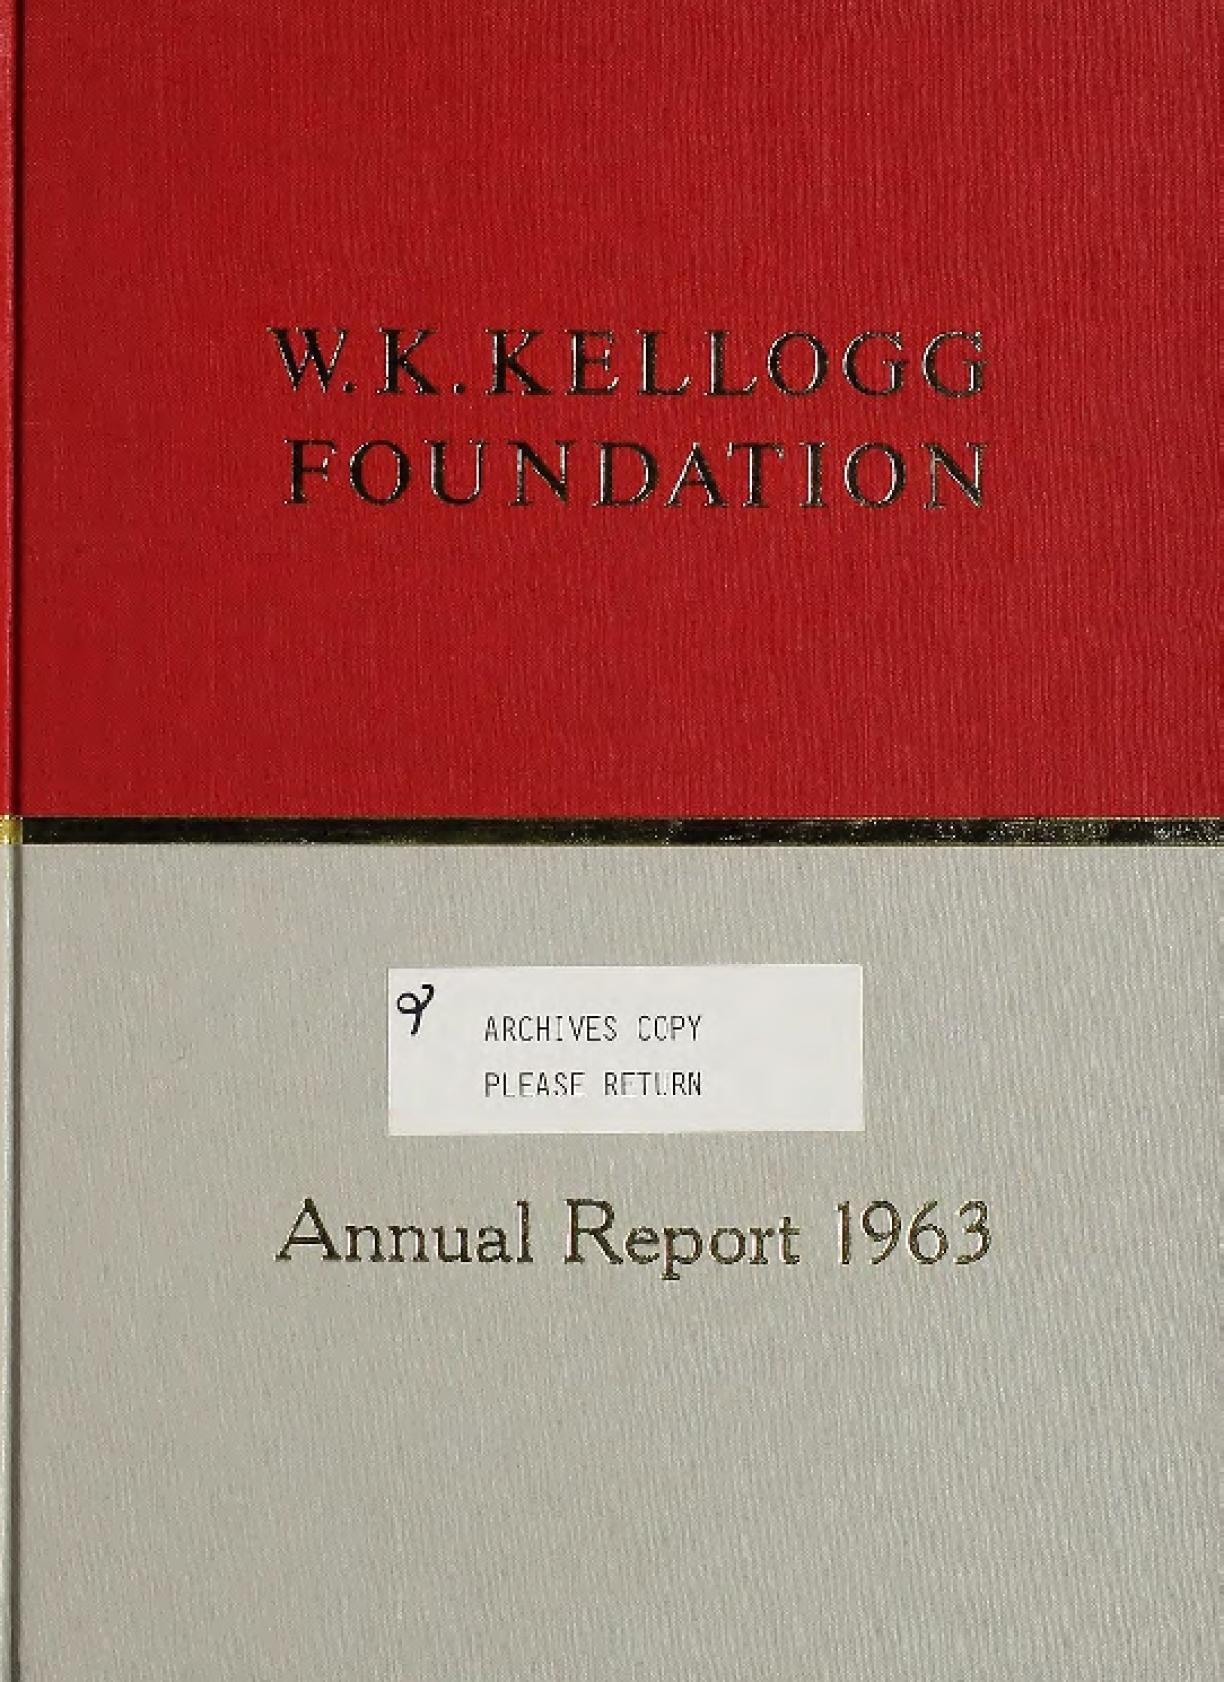 1963 W.K. Kellogg Foundation Annual Report